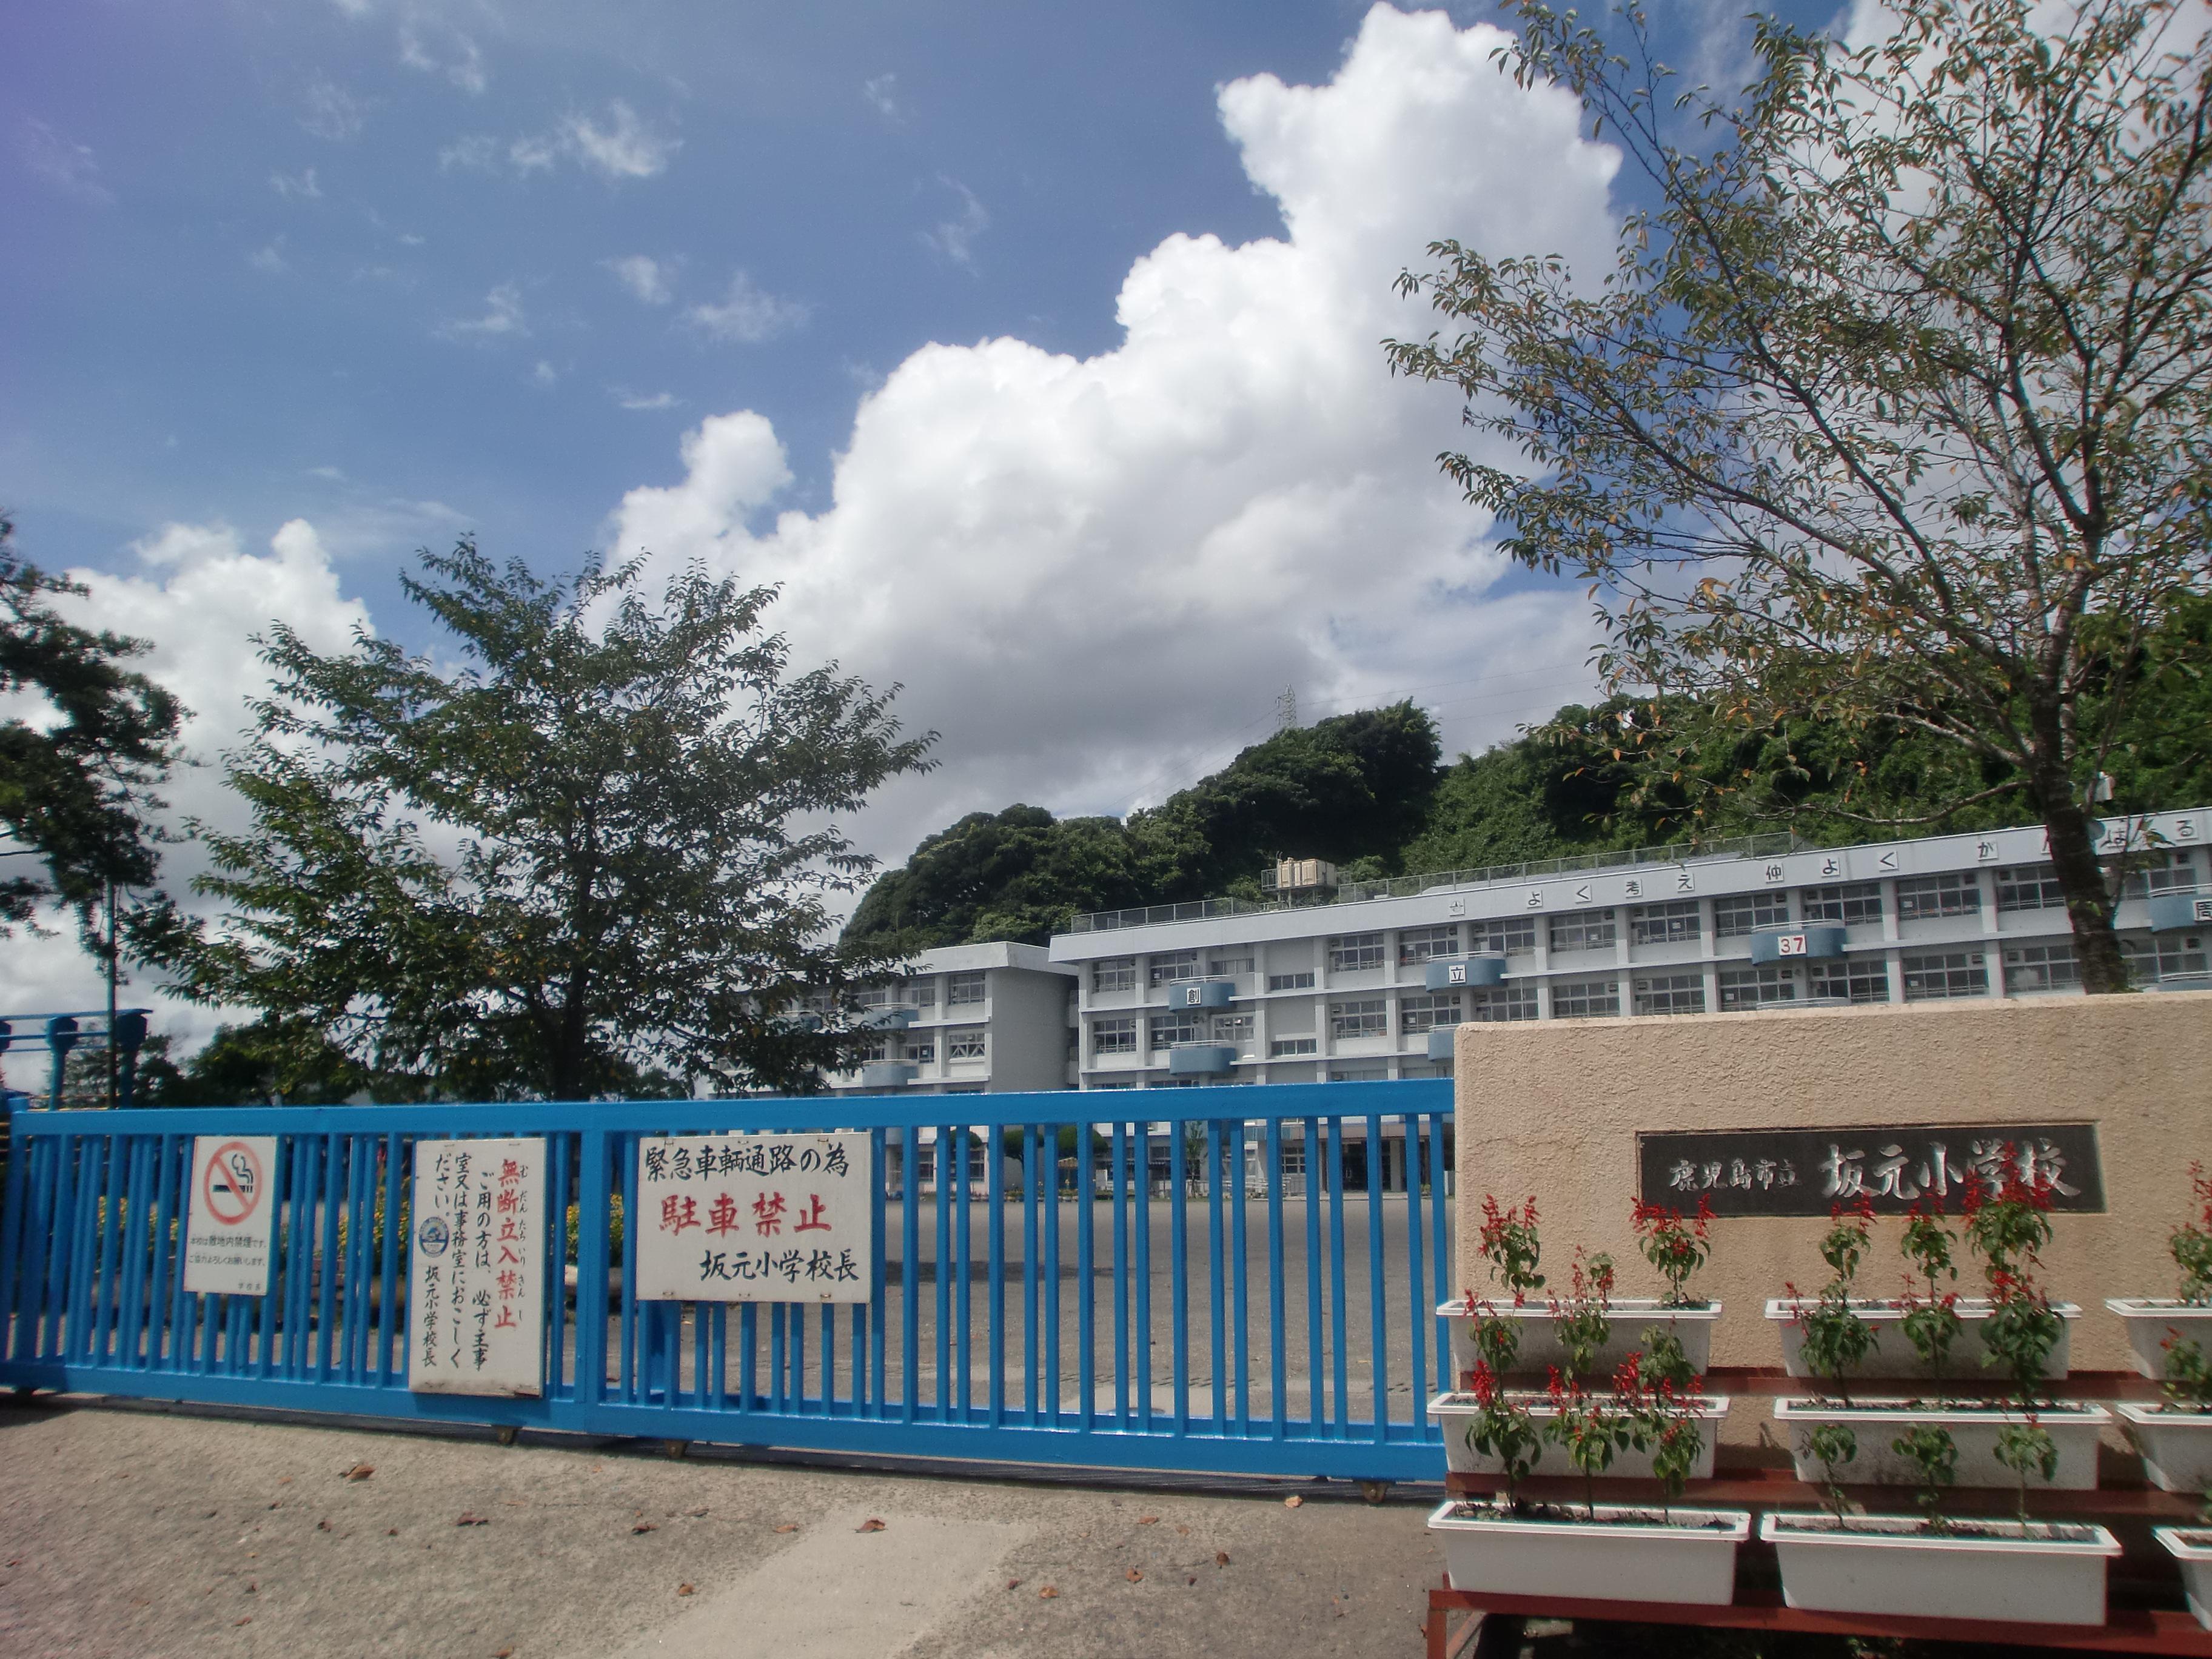 File:Sakamoto Elementary School JPG - Wikimedia Commons